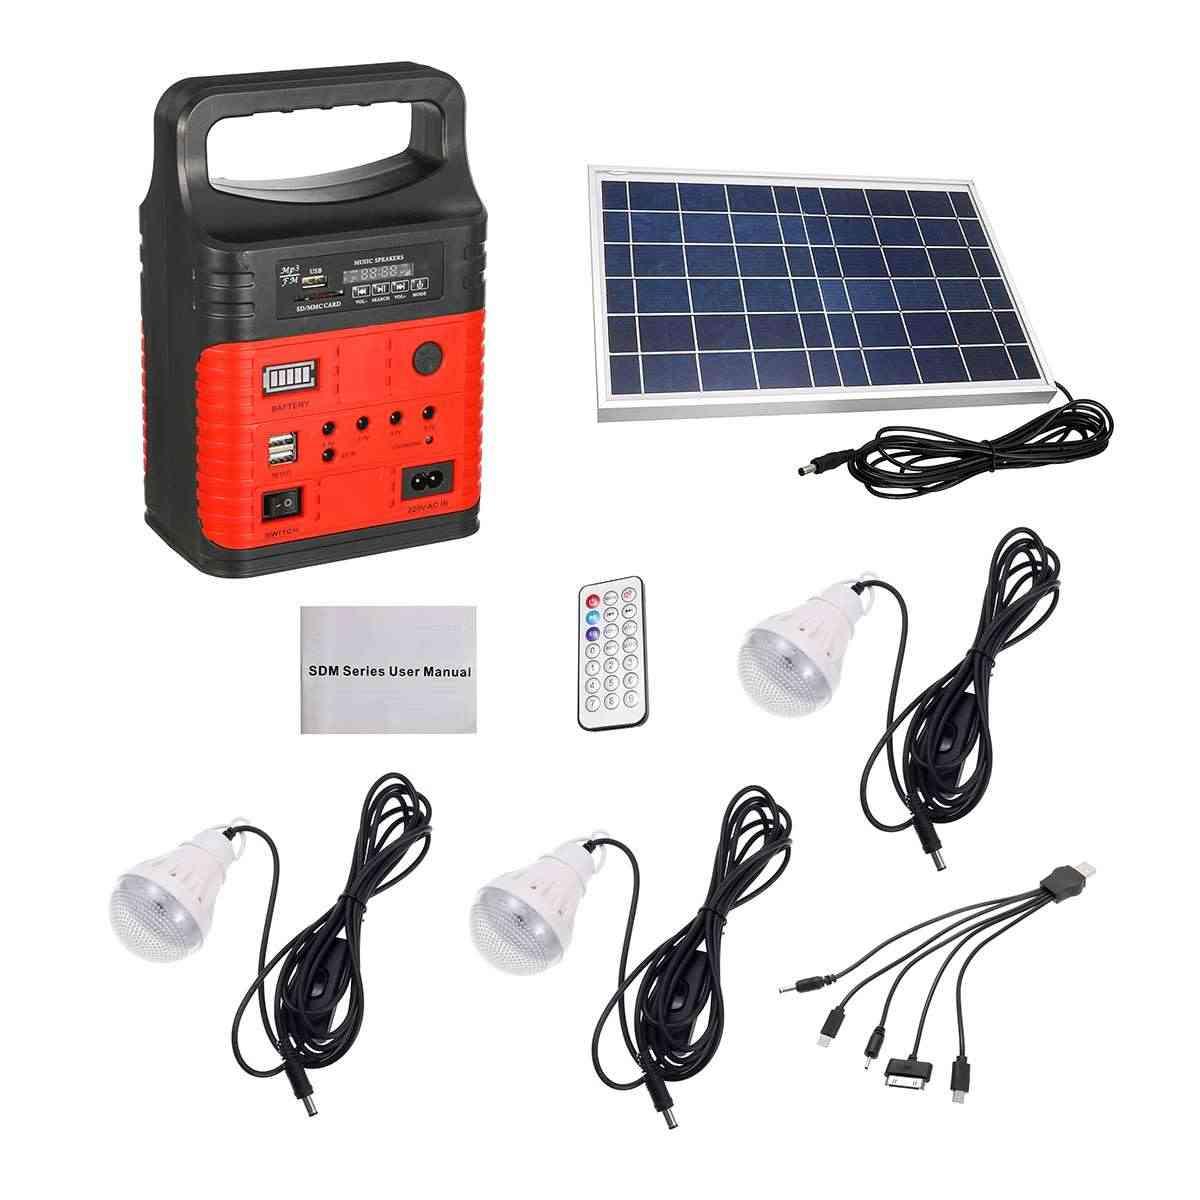 Emergency 3 Led Solar Lighting System Kit - Outdoor Power Supply Mp3 Radio Flashlig